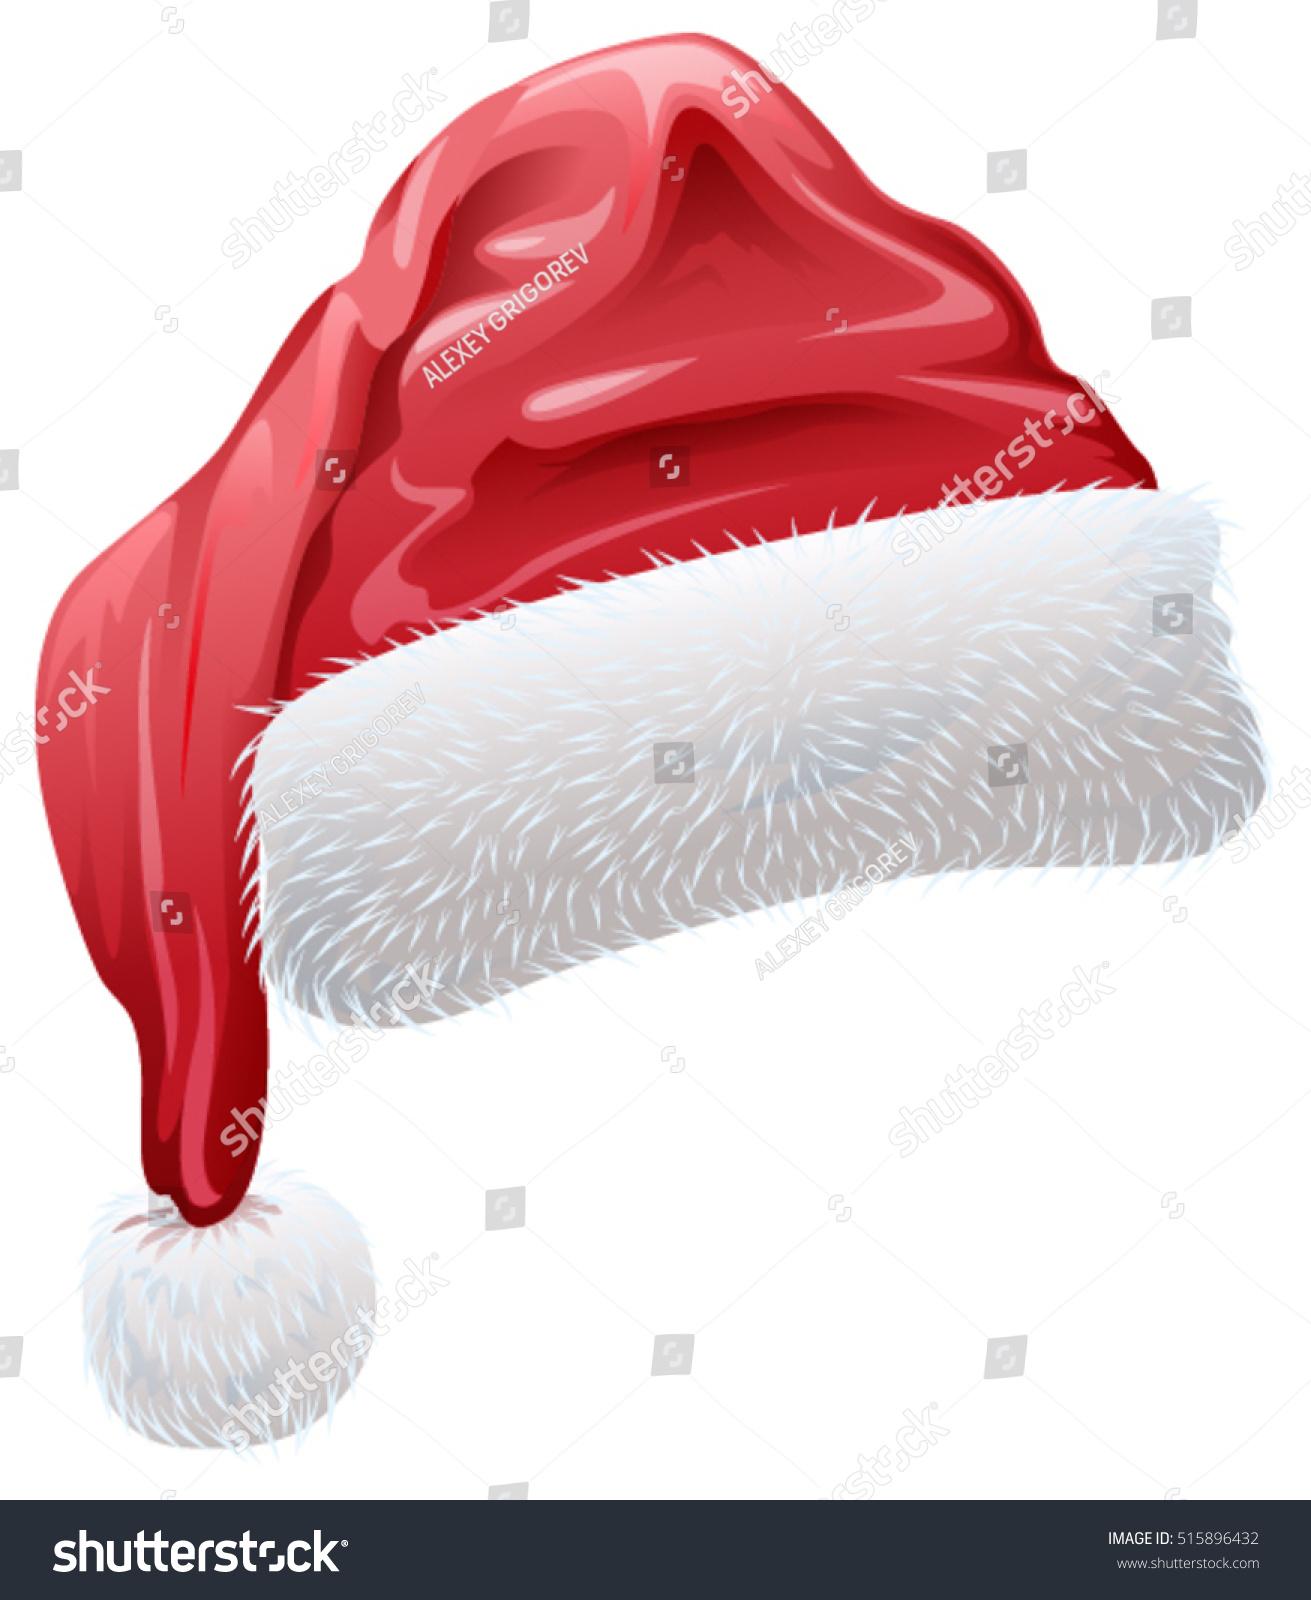 76ecce461b9c5 Red Santa Hat Fluffy White Fur Stock Vector (Royalty Free) 515896432 ...